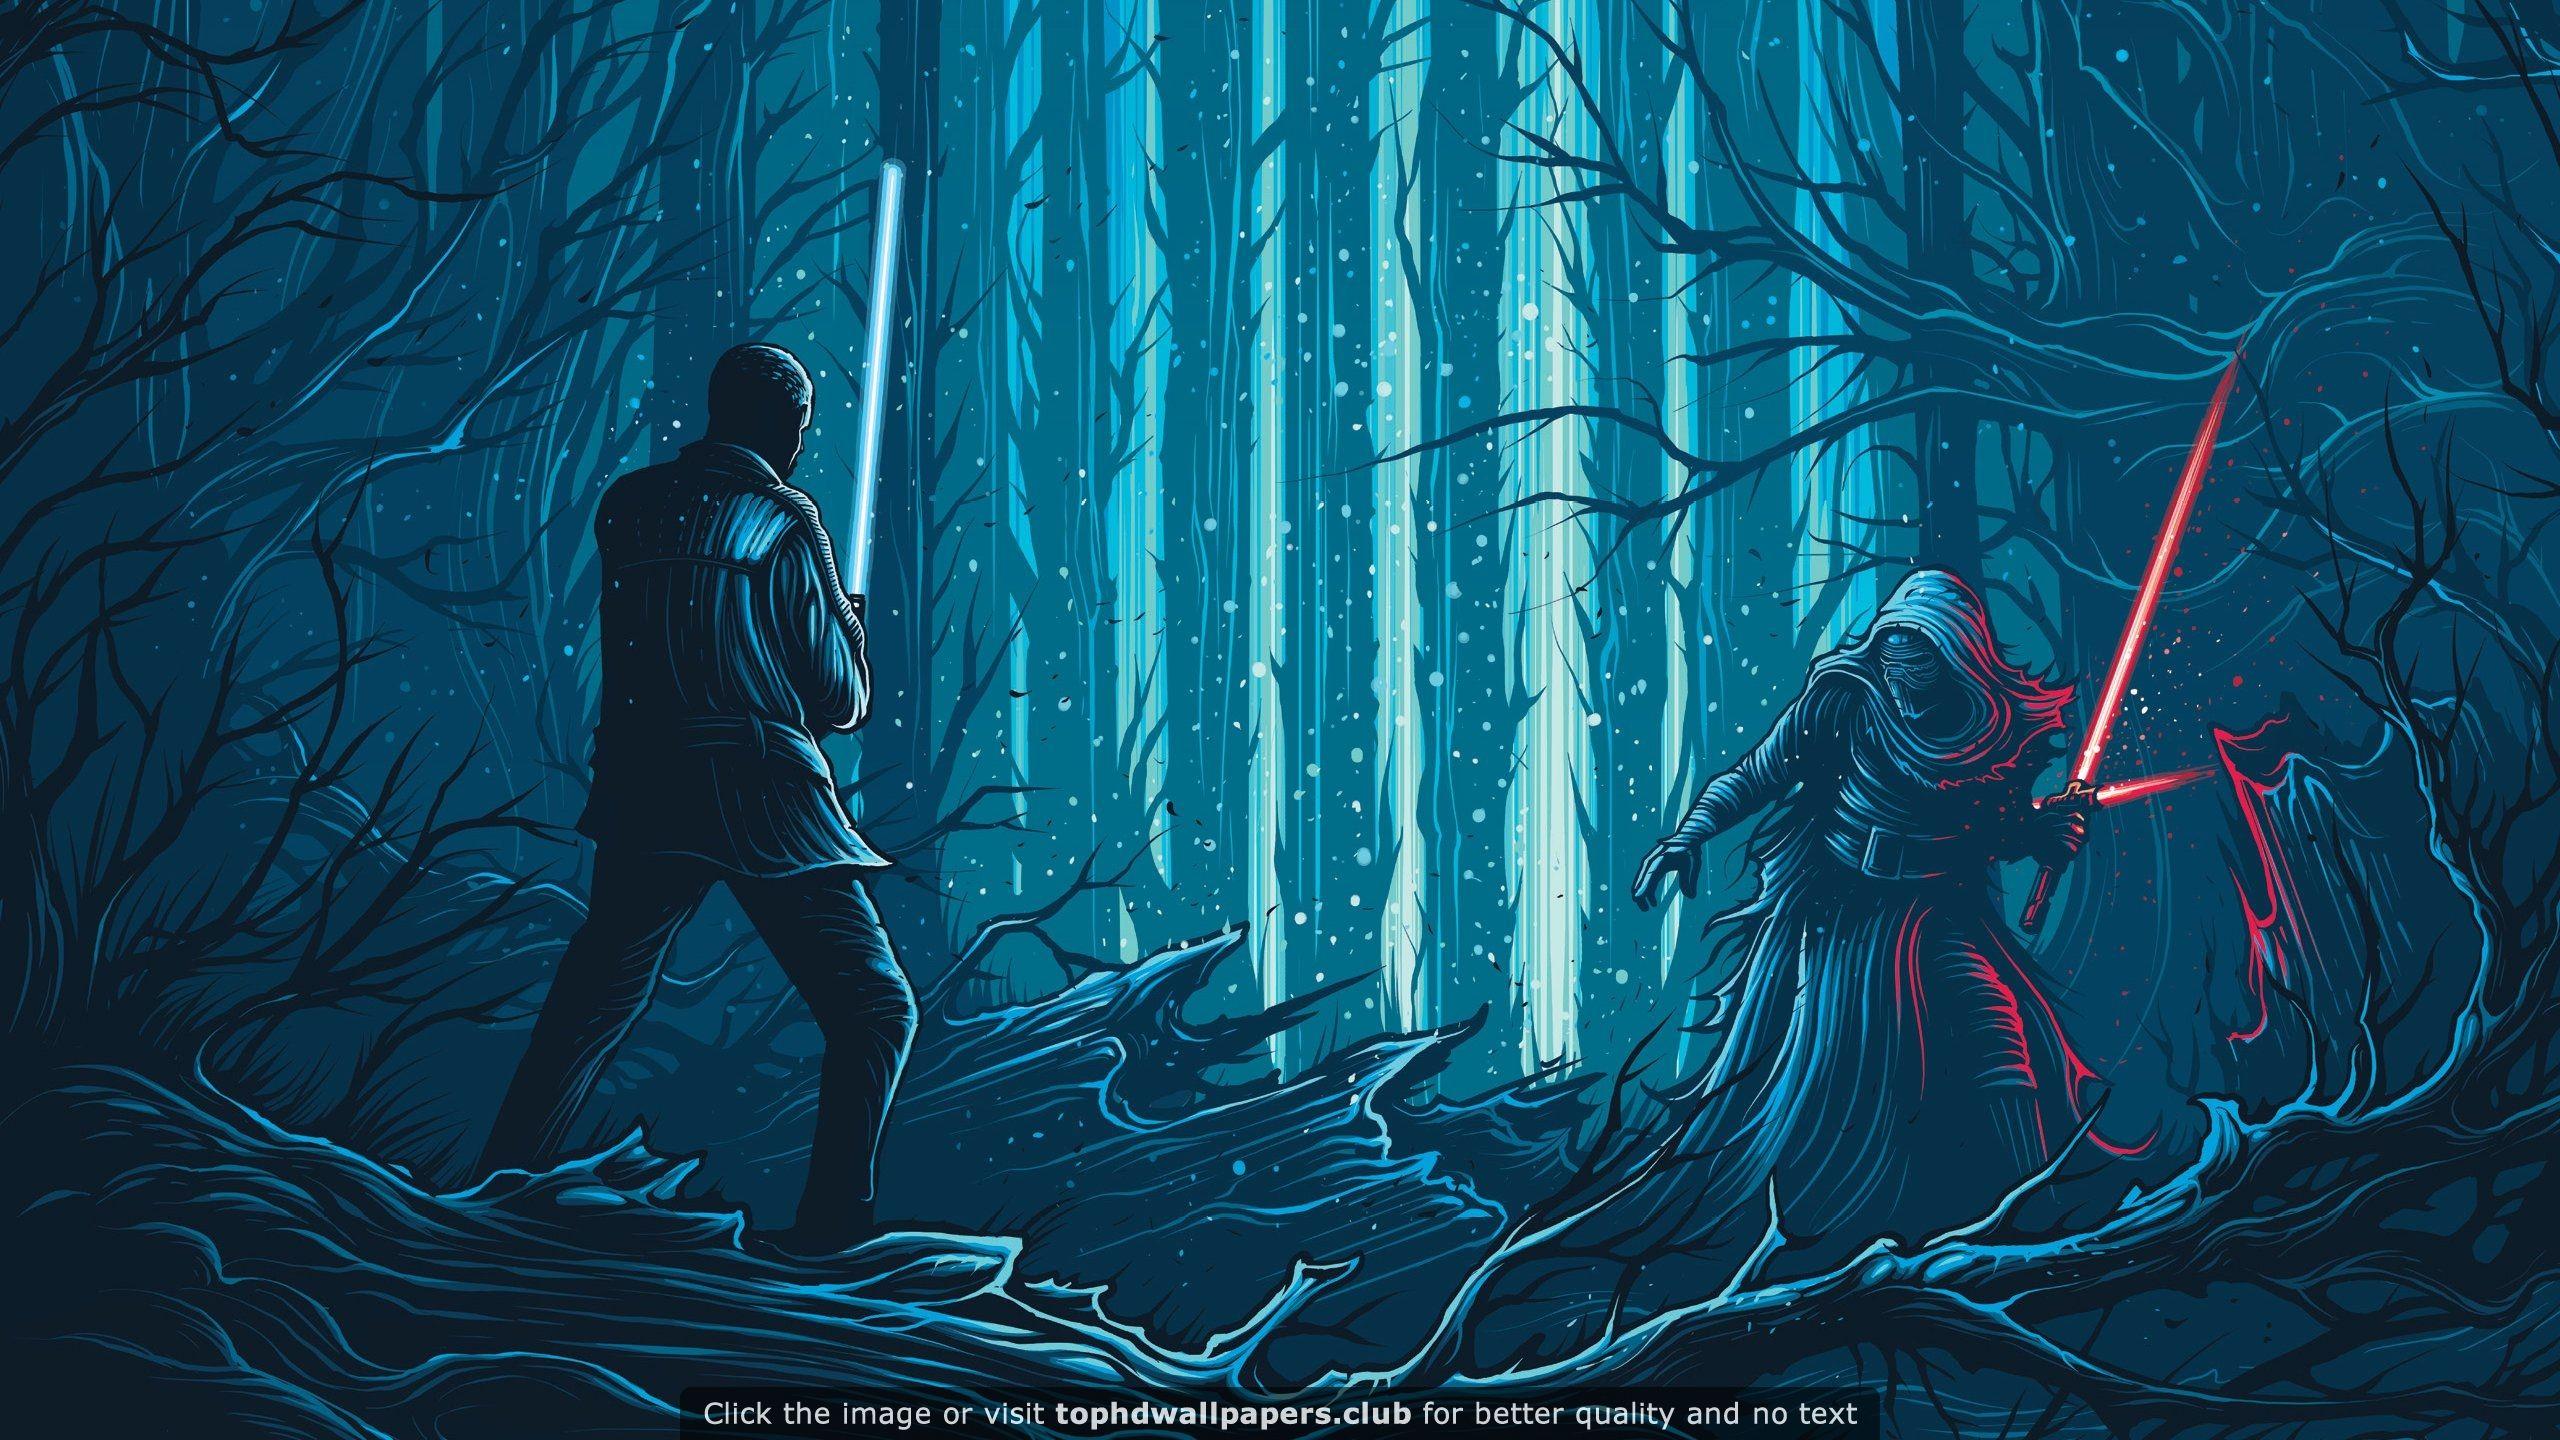 Star Wars Fight Scene Hd Wallpaper Star Wars Illustration Star Wars Wallpaper Star Wars Background